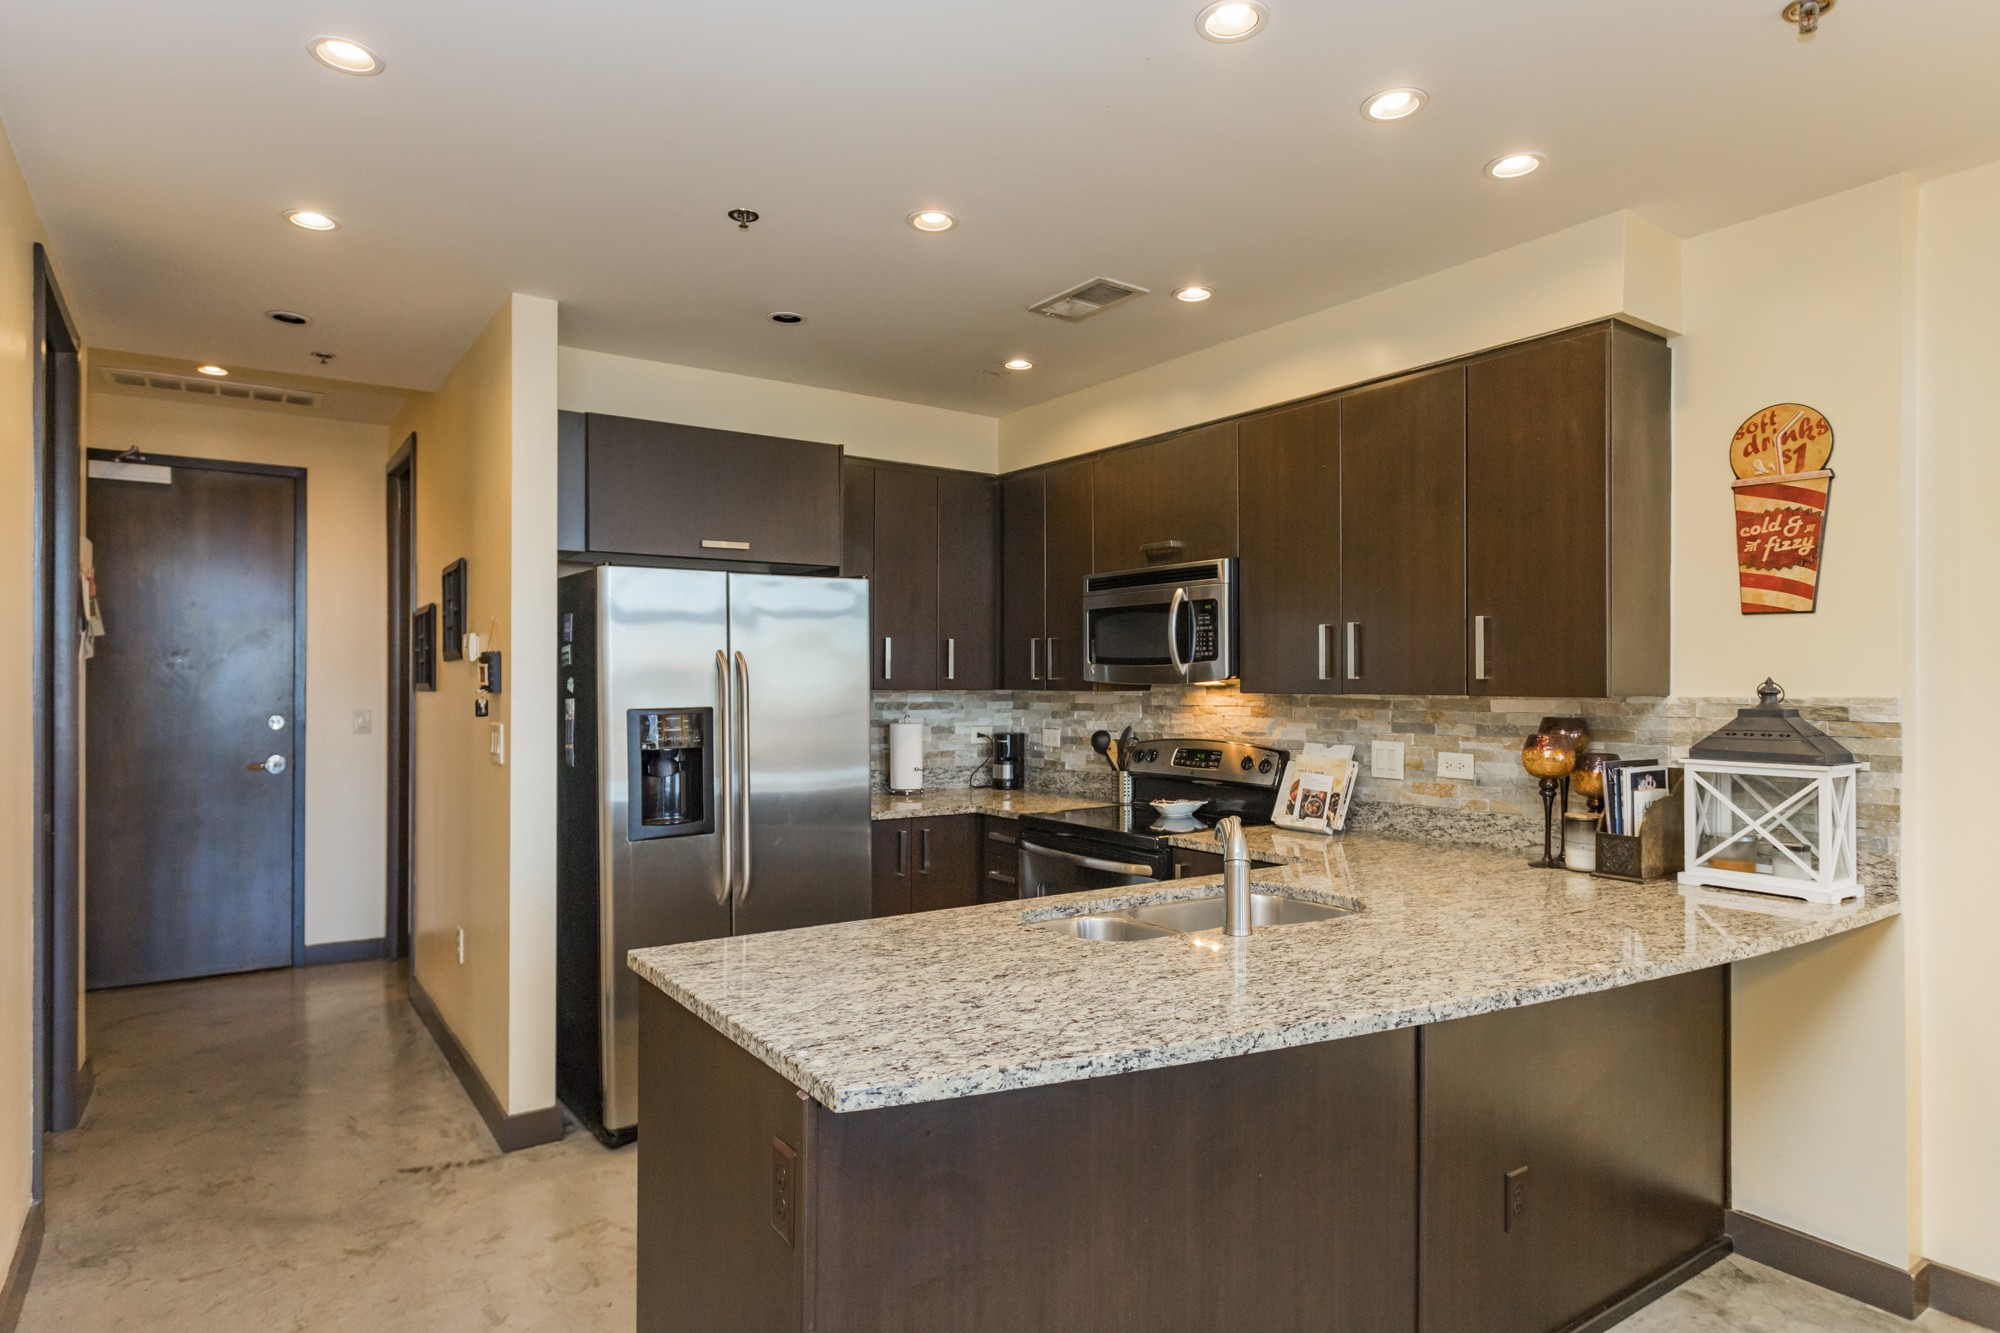 1510 Demonbreun St, Nashville, TN 37203 - Nashville, TN real estate listing